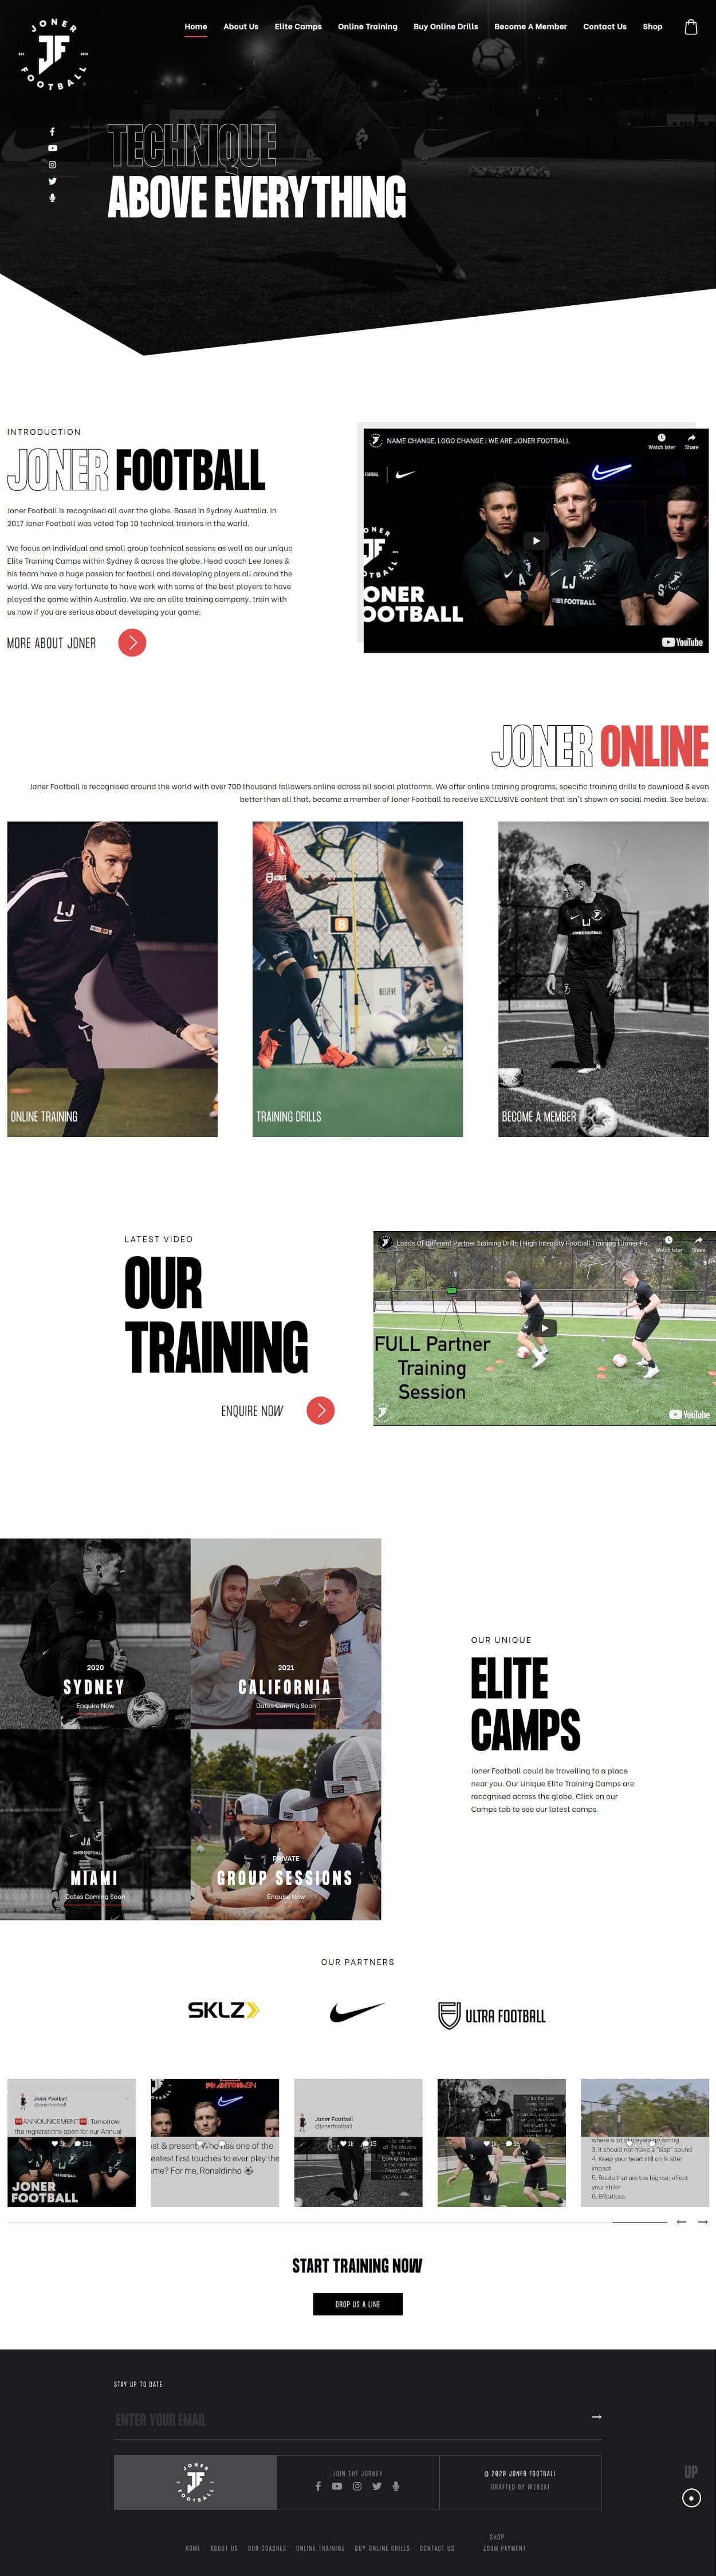 football-website-design